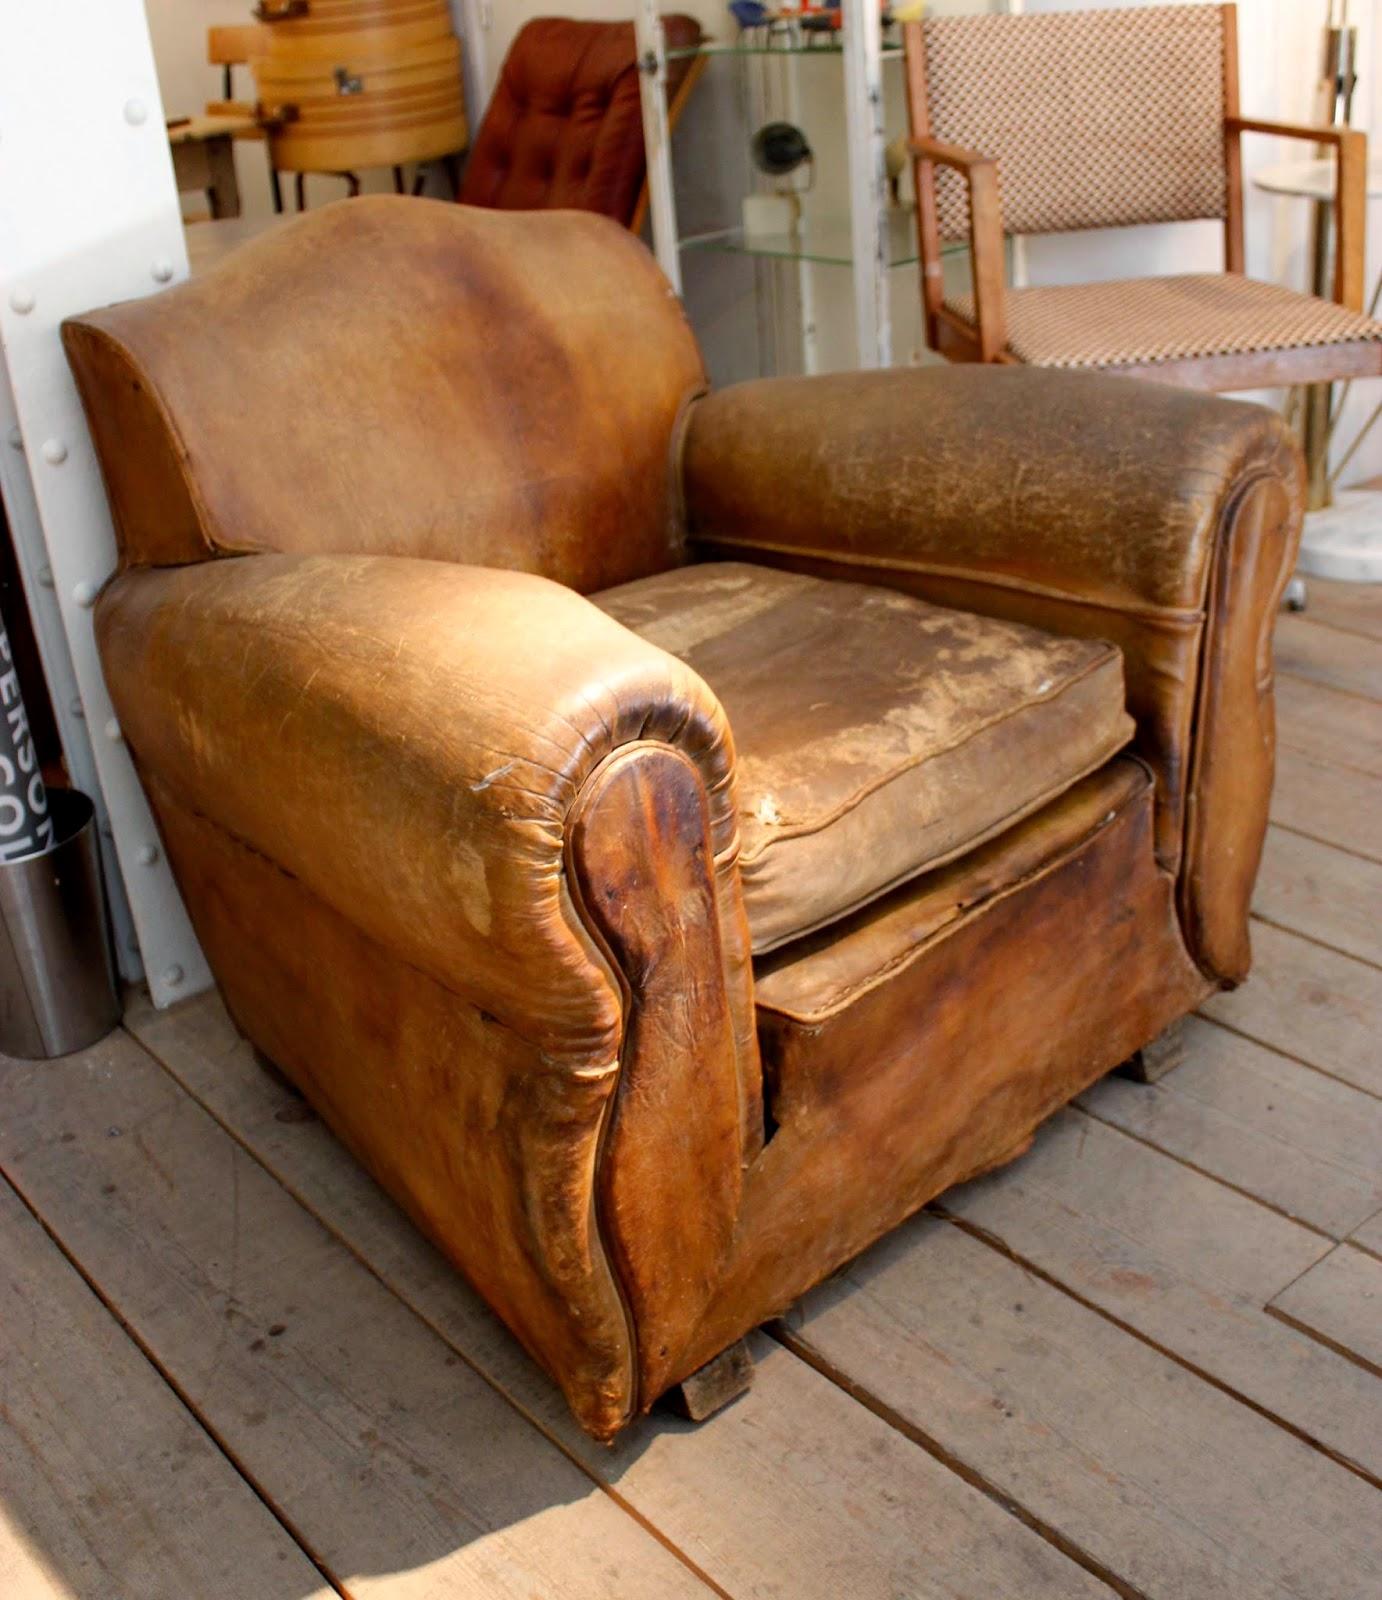 Venta Muebles Vintage Online Muebles Auxiliares Mueble Vintage  # Muebles Retro Baratos